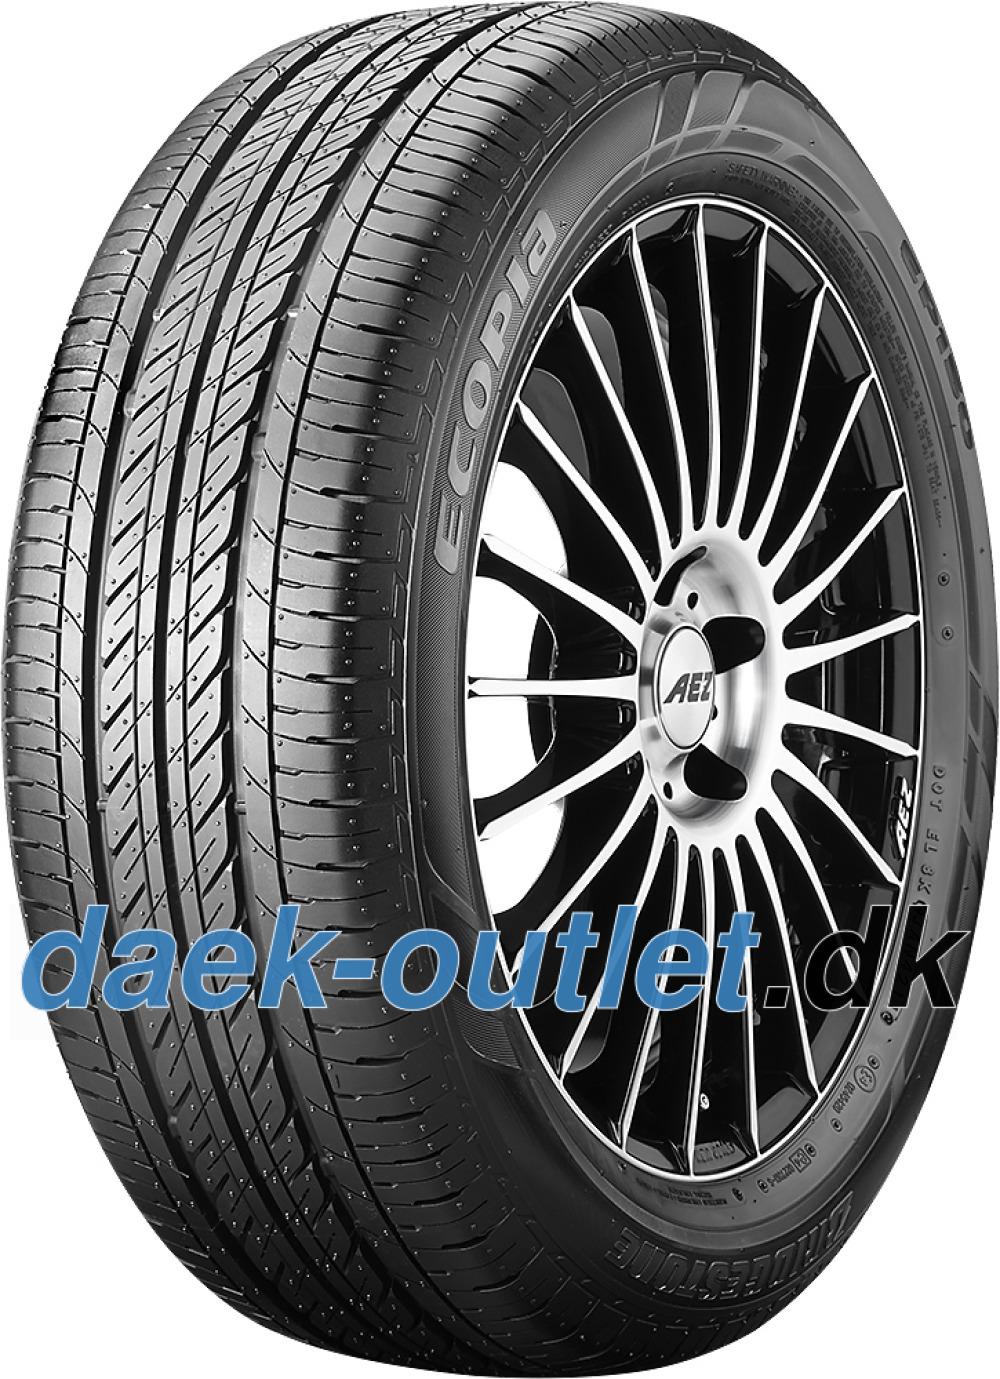 Bridgestone Ecopia EP150 ( 185/55 R16 83V )